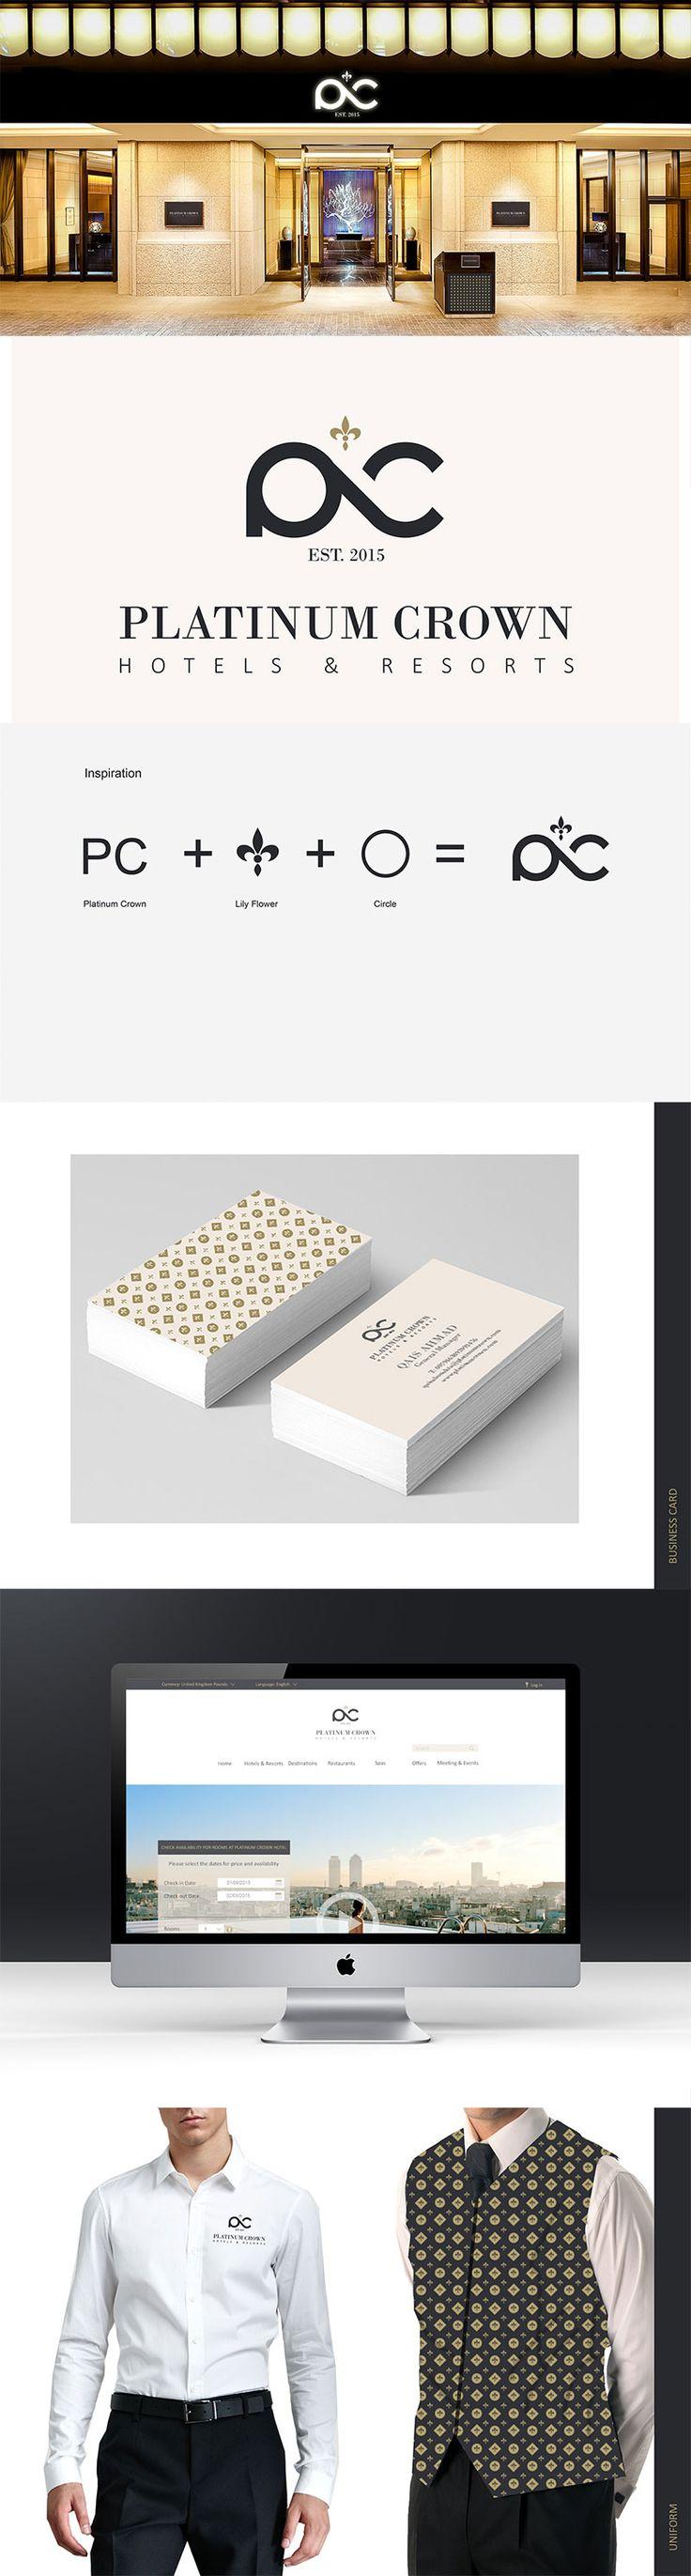 Hotel Branding Design 30 Creative Examples for